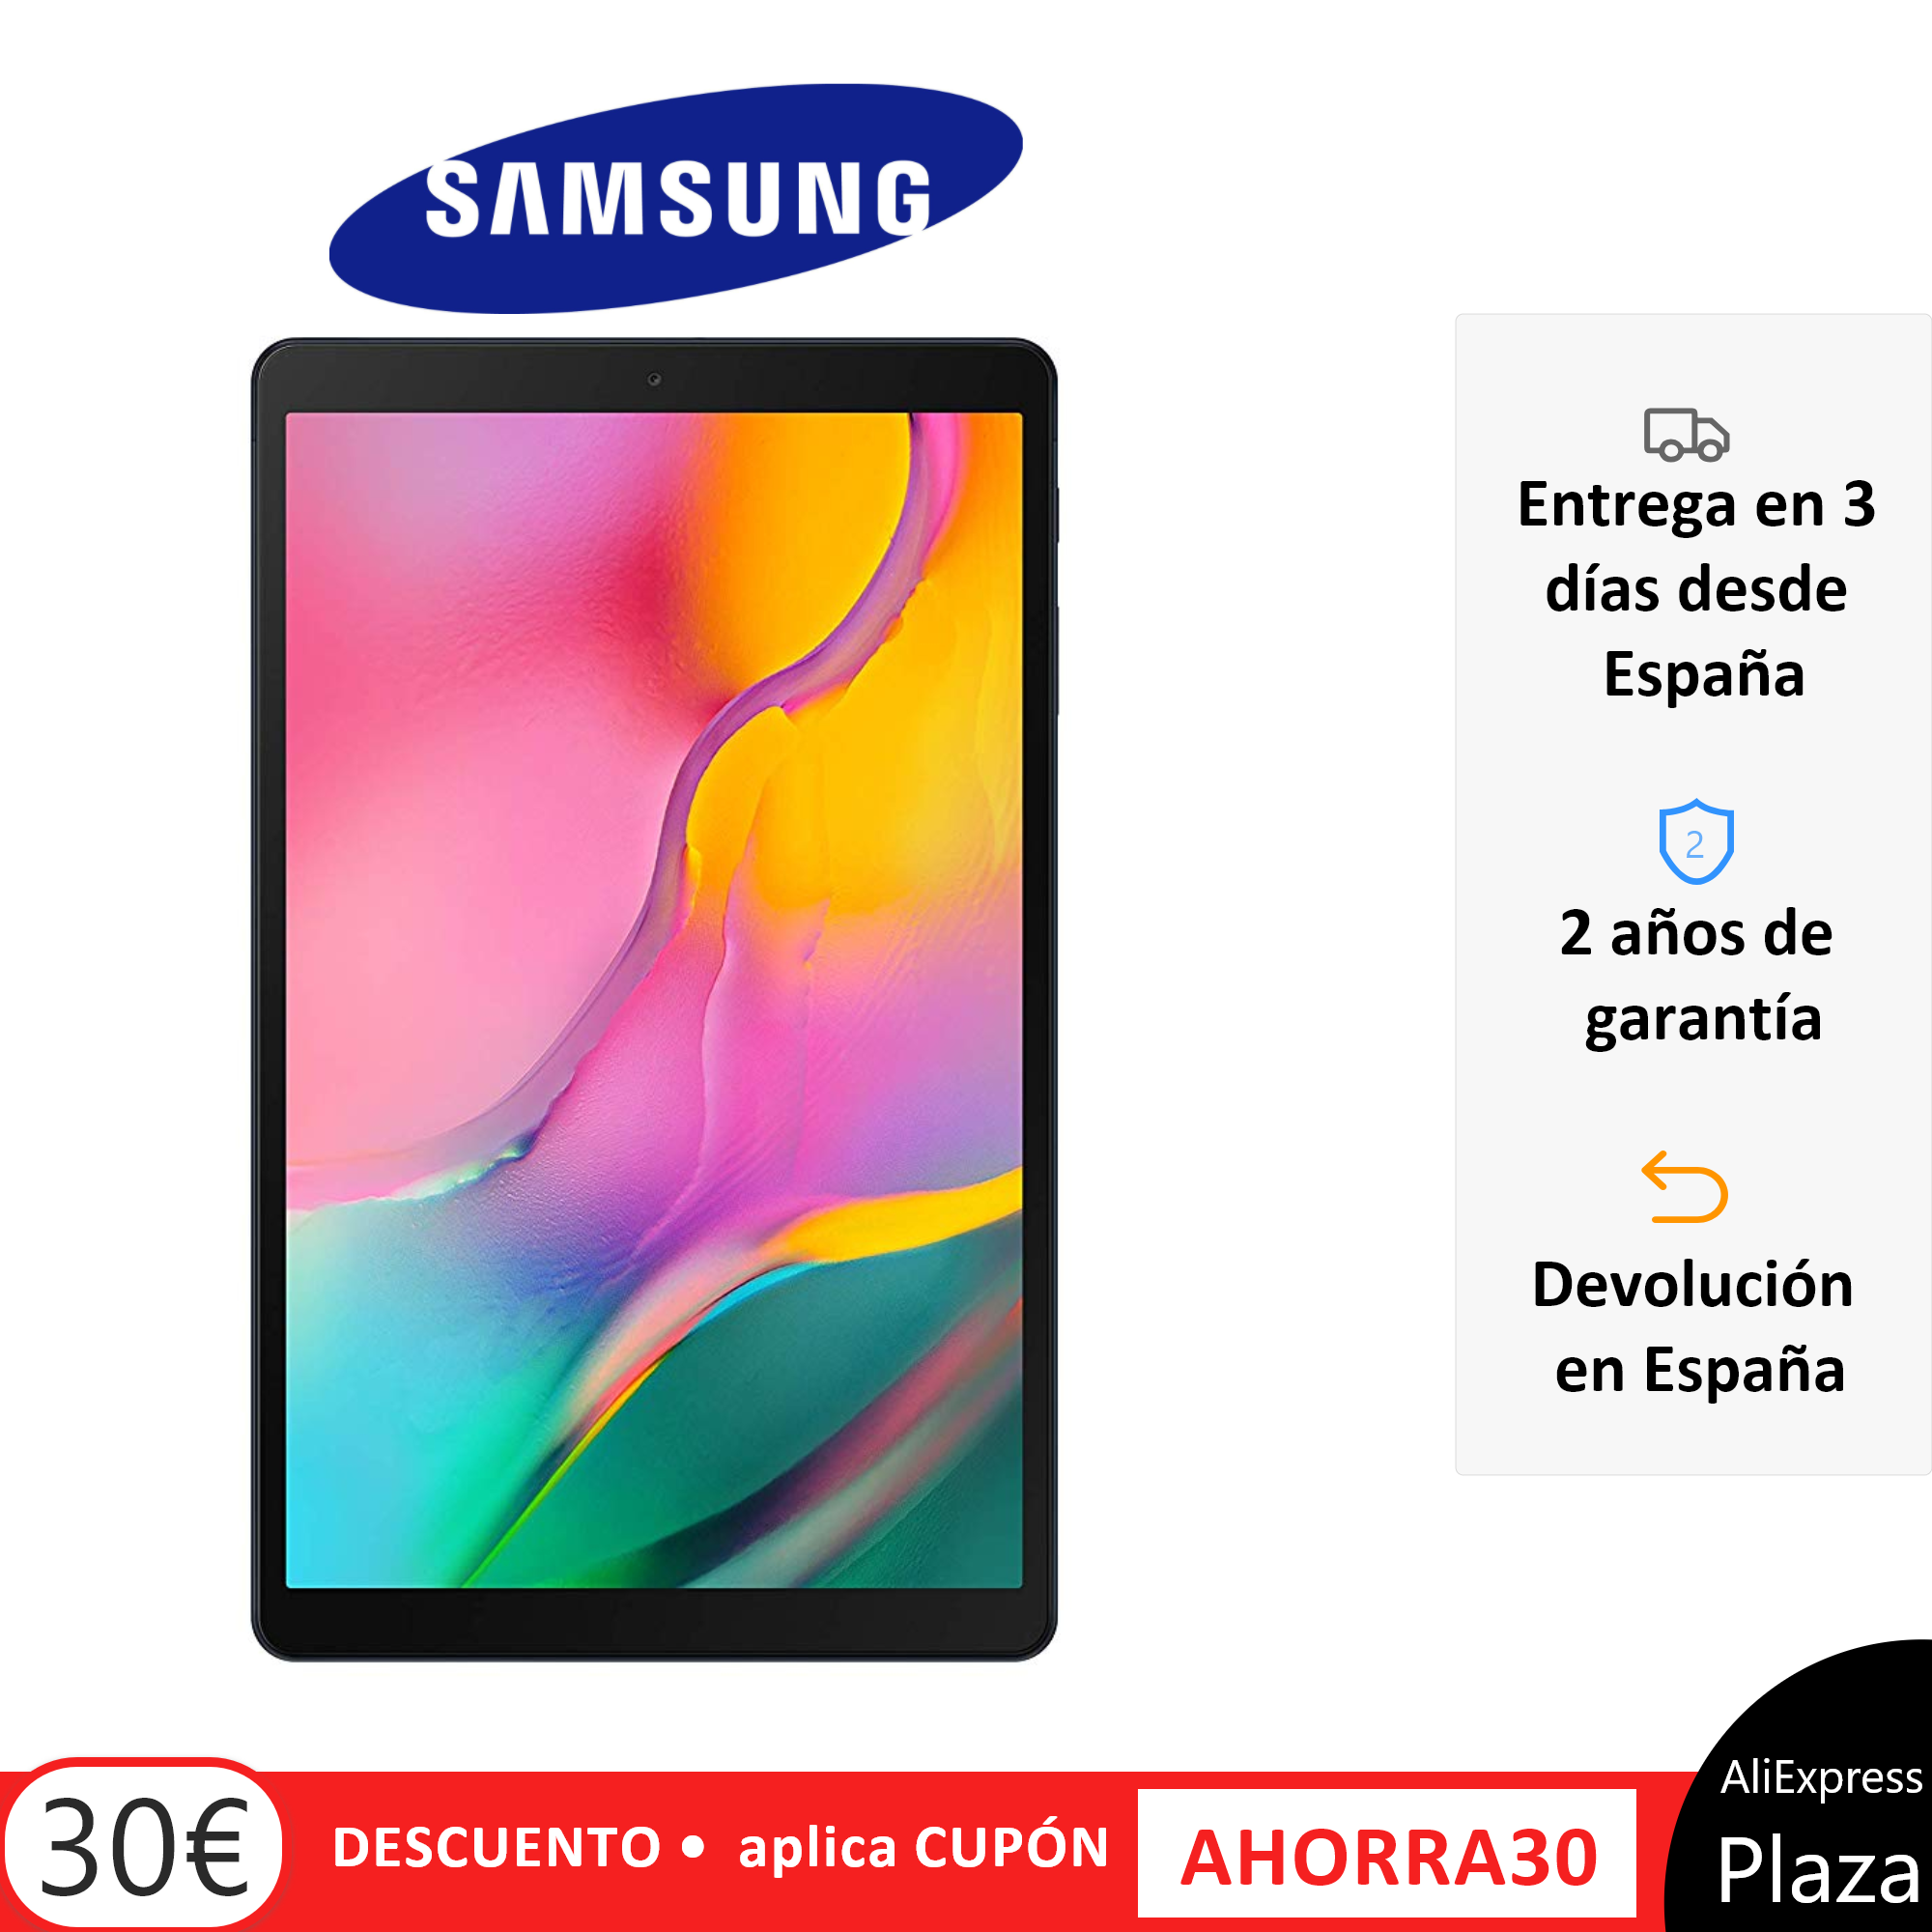 Tablet Samsung Galaxy Tab A, Modelo T510 (2019), Color Negro (Black), Banda WiFi, 32 GB de Memoria Interna, Pantalla panorámica